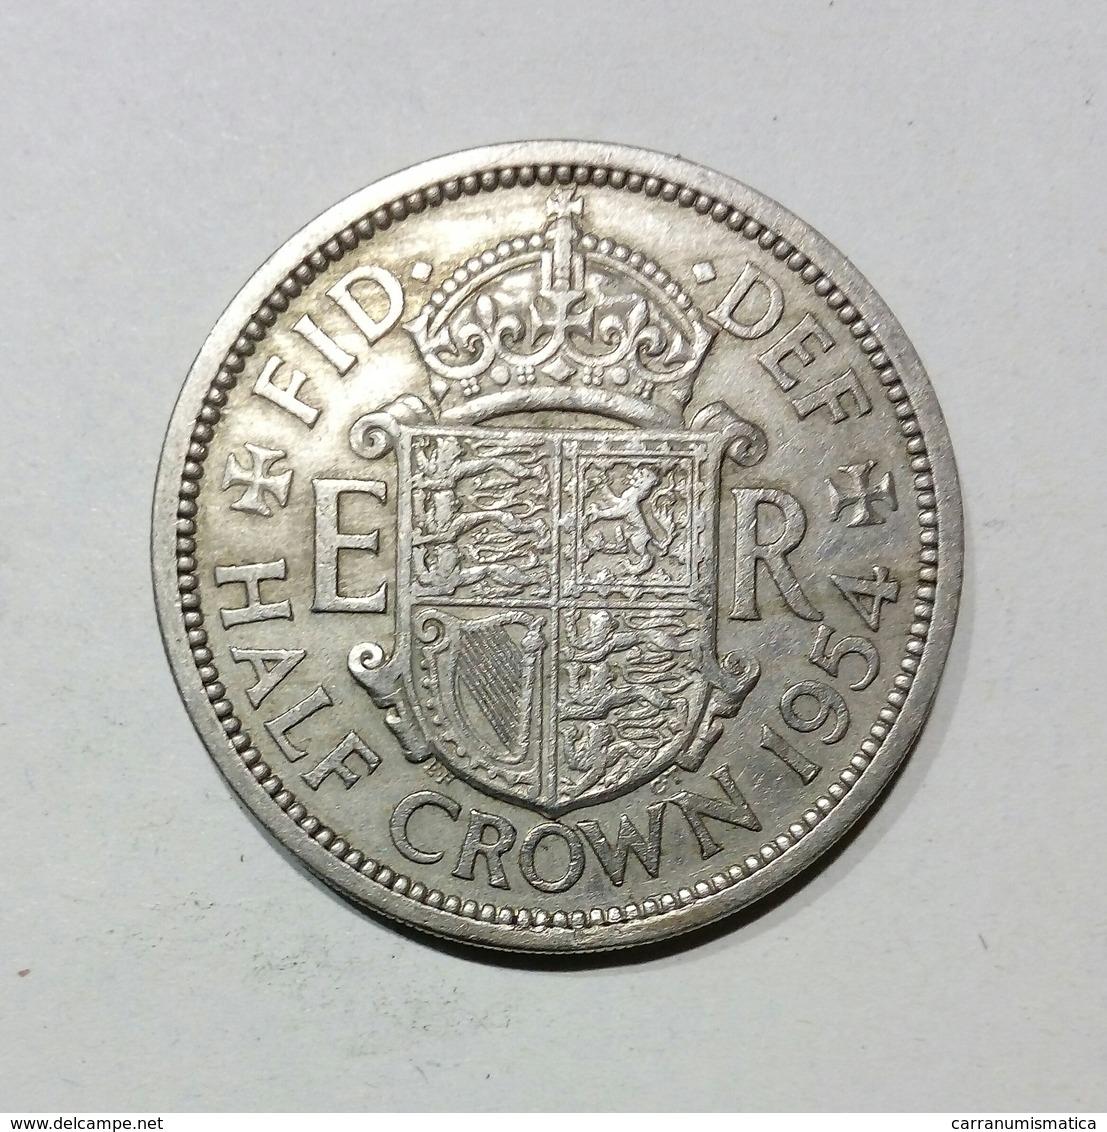 GRAN BRETAGNA / UNITED KINGDOM - HALF CROWN ( 1954 ) Elizabeth II - K. 1/2 Crown